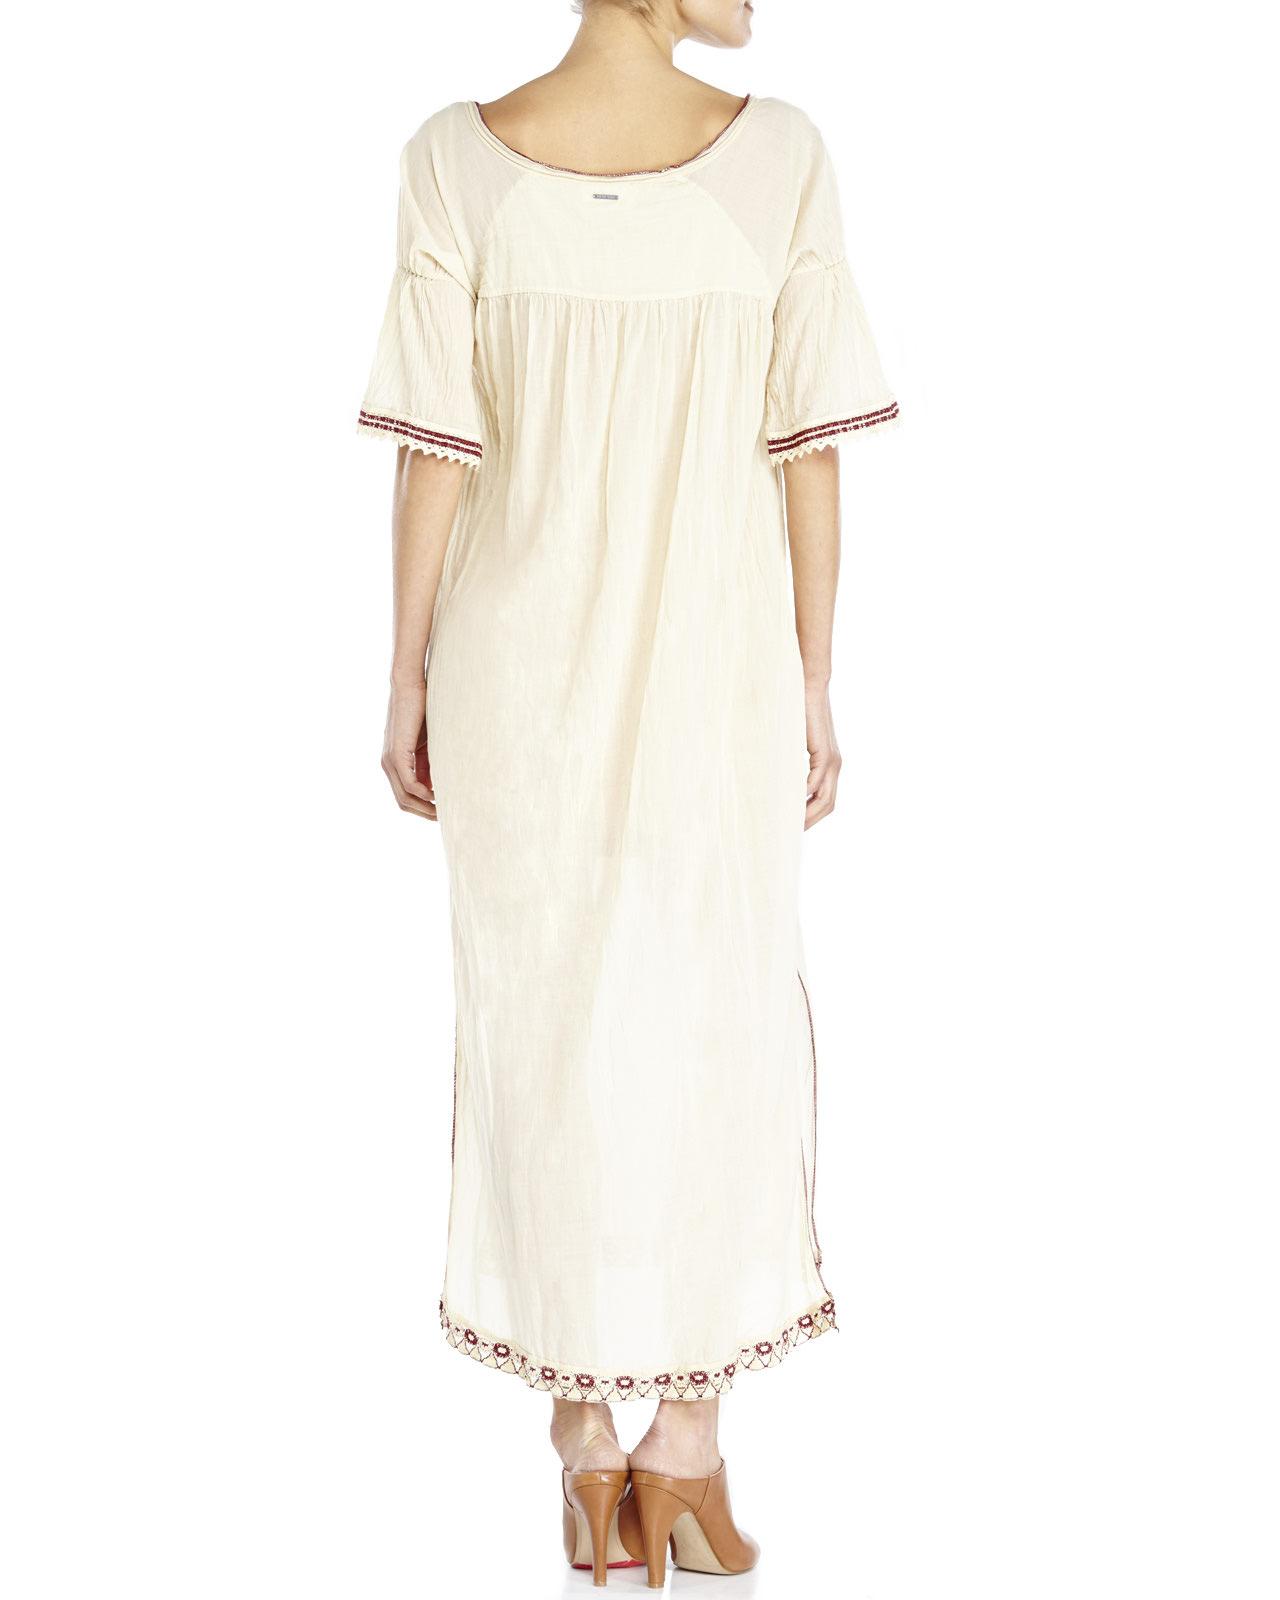 Century 21 ottod 39 ame keyhole hi low dress in beige light for Century 21 dress shirts